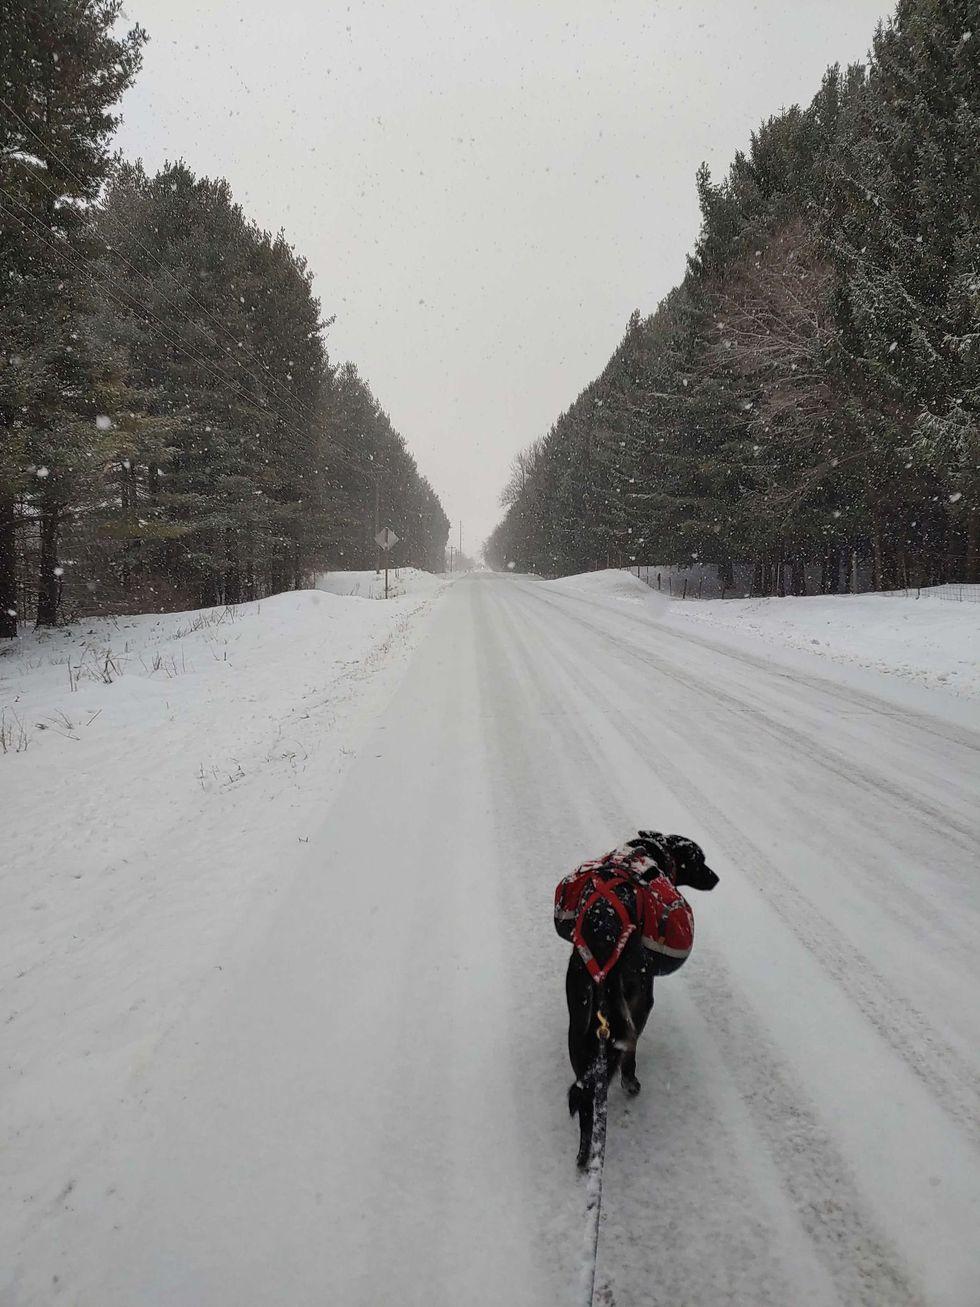 Diggins the Minnesotan sled dog hikes along a snowy road